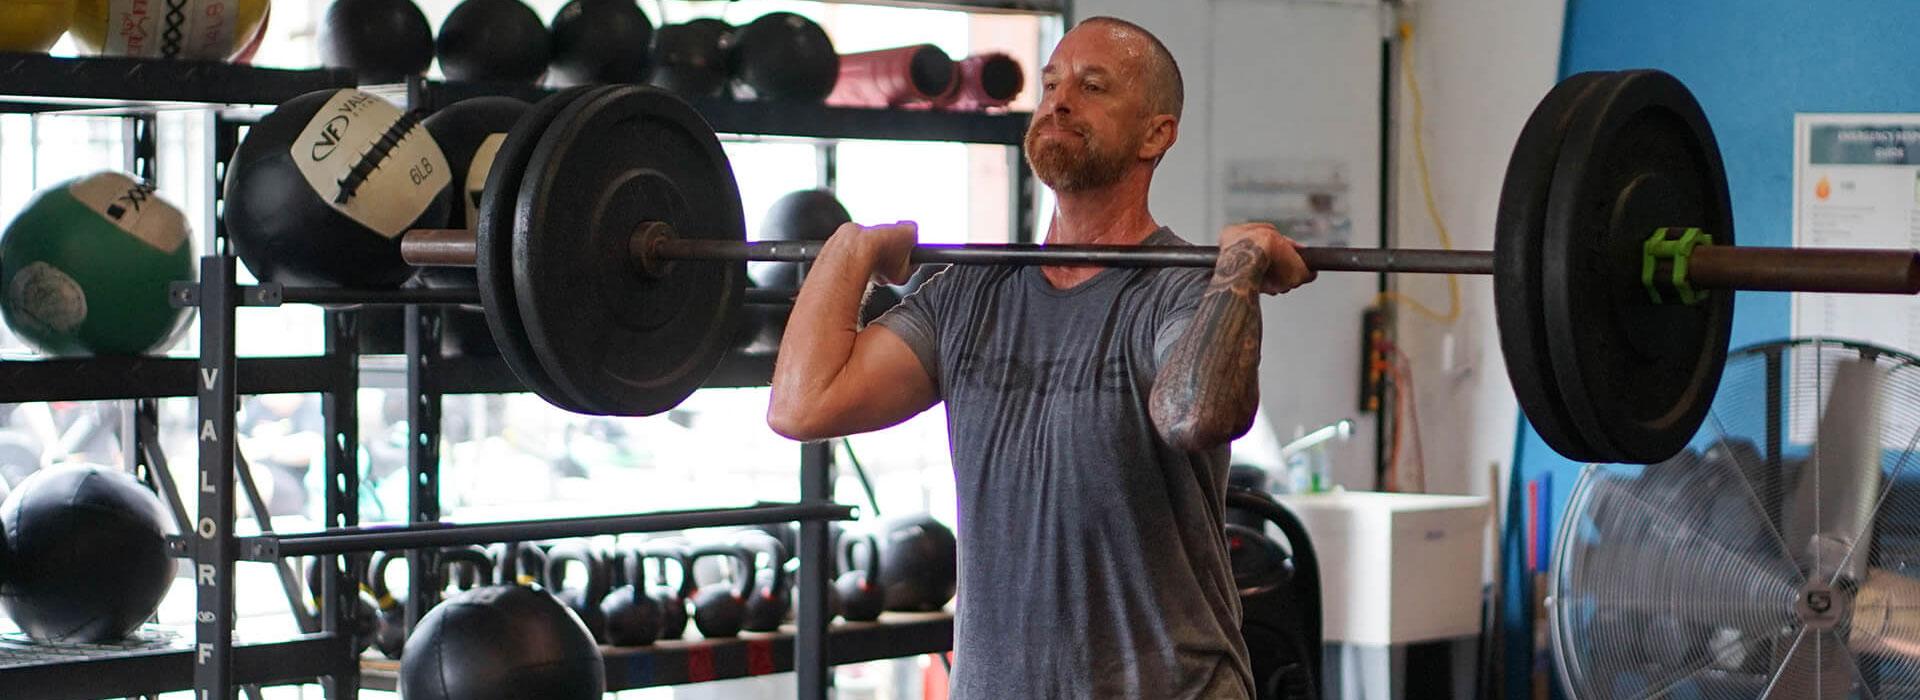 Olympic Weightlifting Training in Odessa FL, Olympic Weightlifting Training near Odessa FL, Olympic Weightlifting Training near Tampa FL